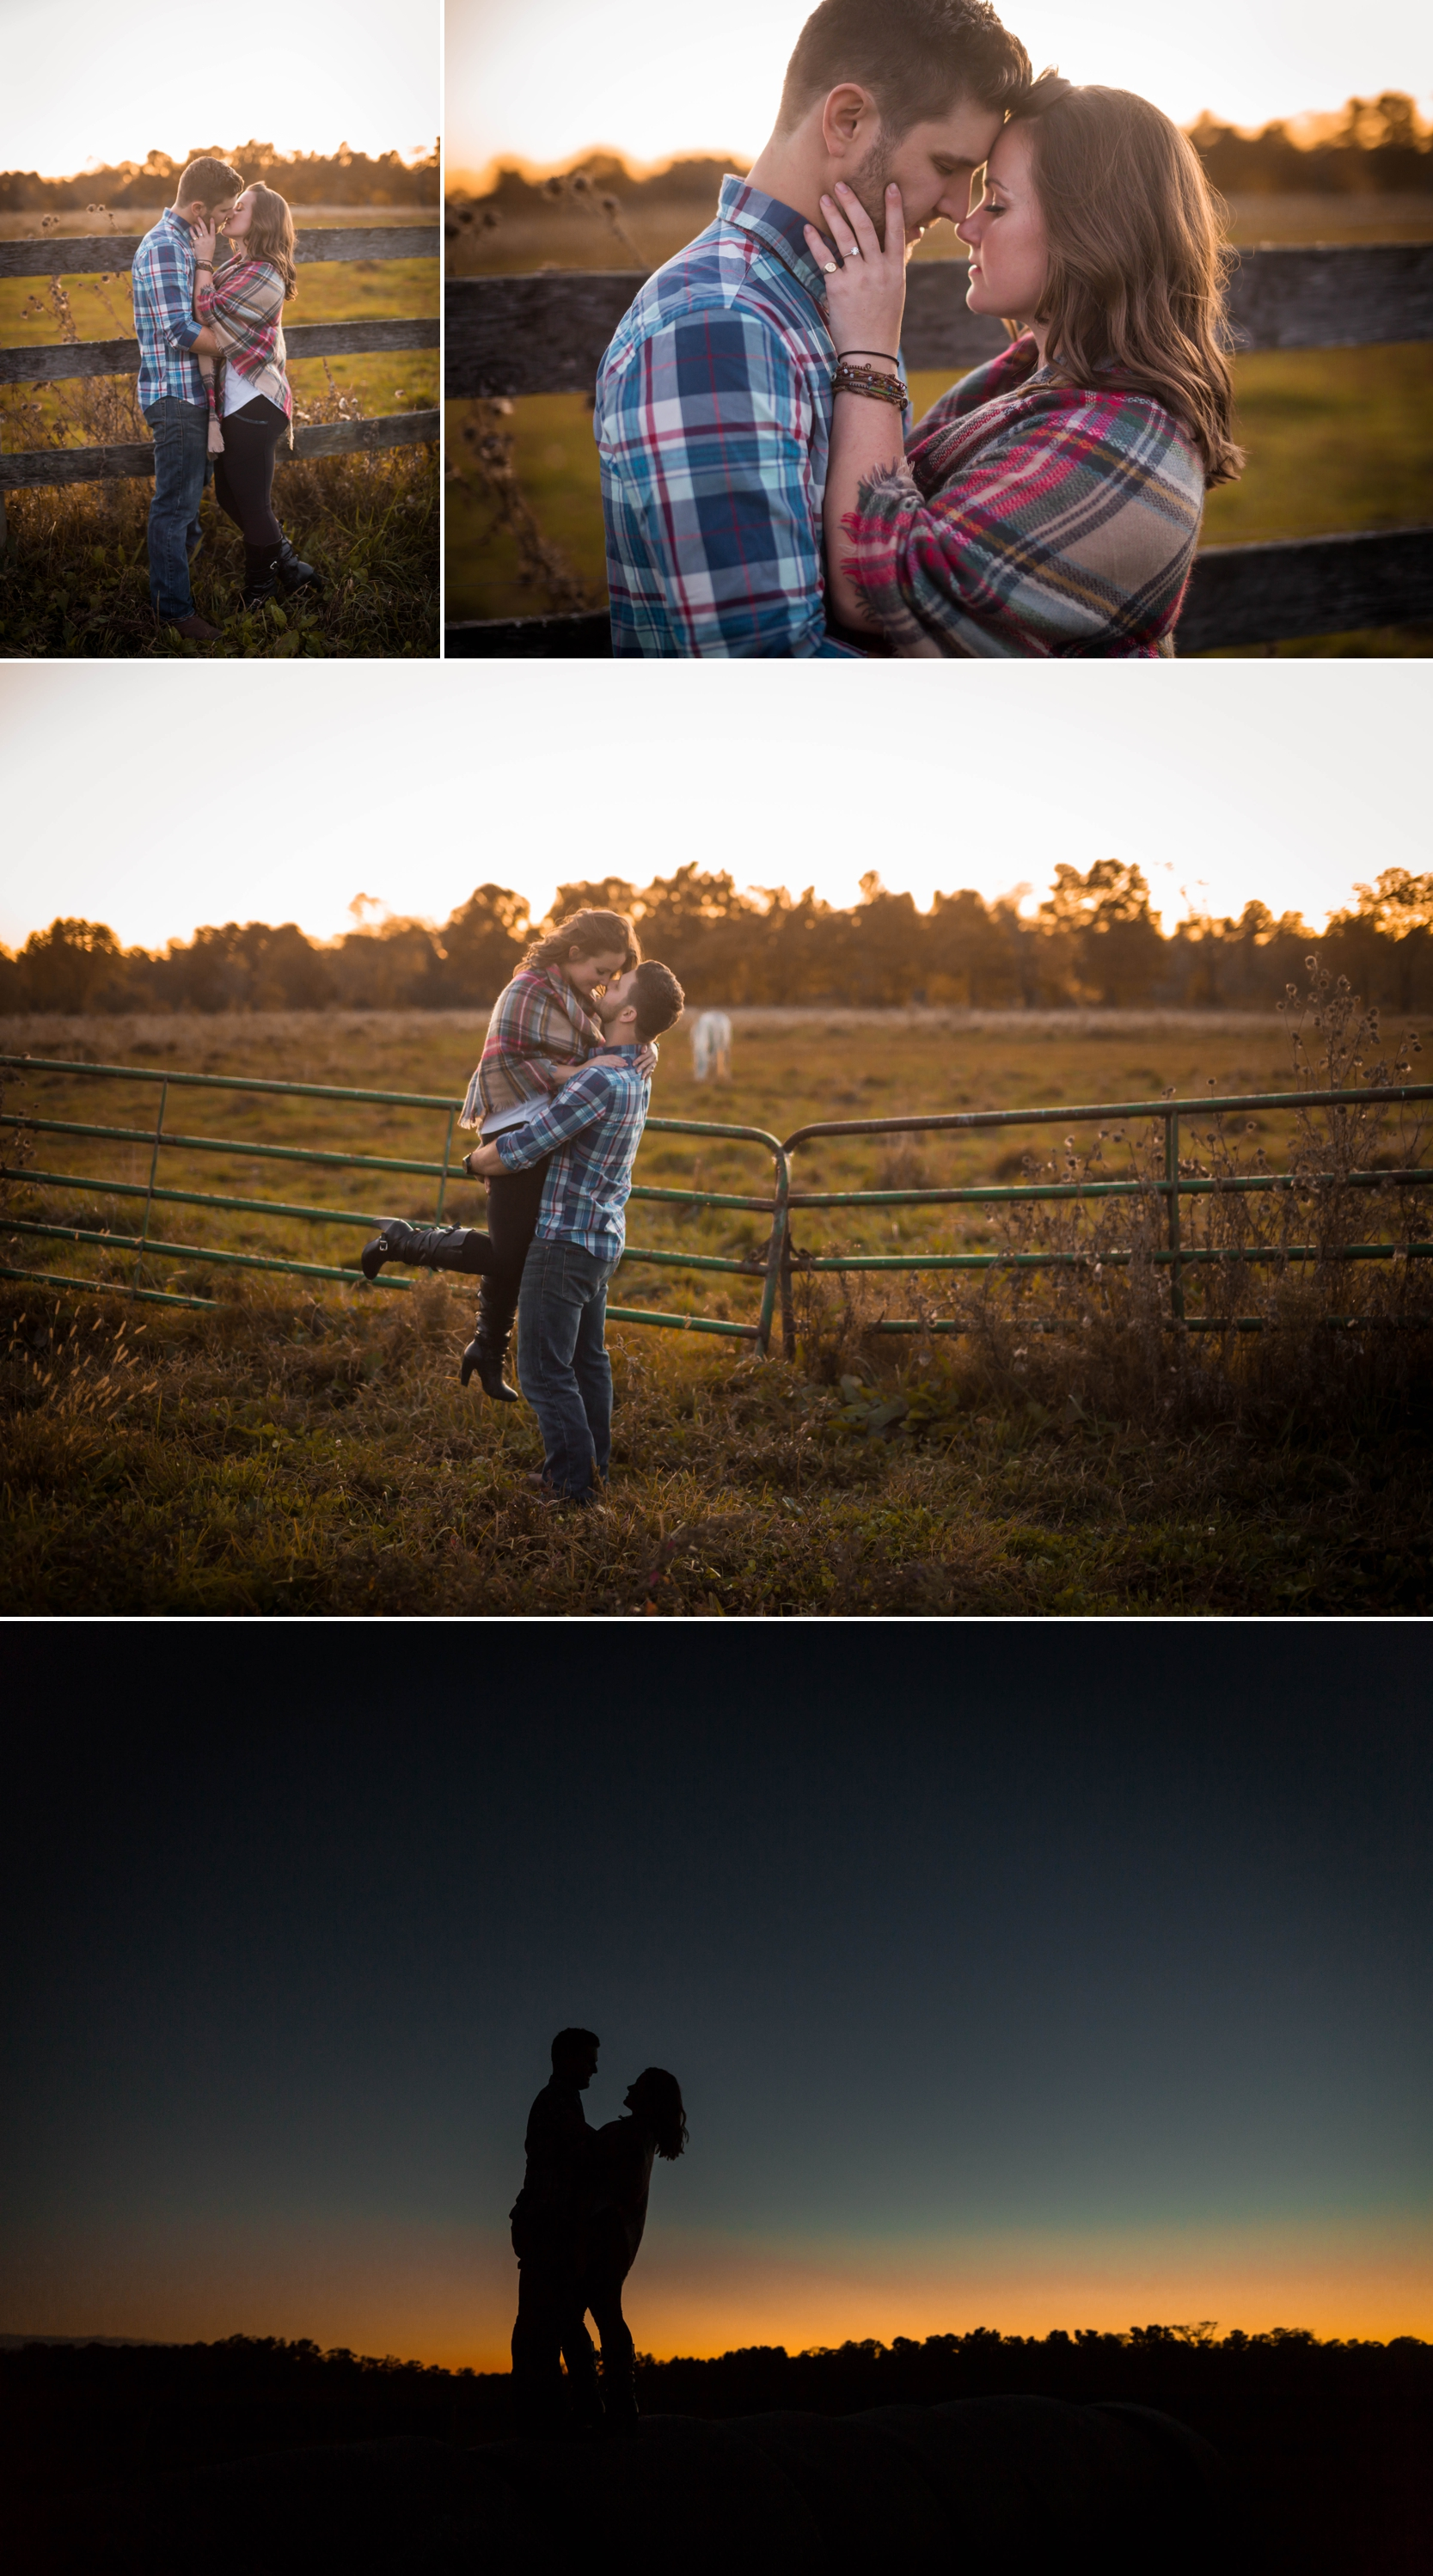 engagement session-farm-horse-purdue university-purdue-lafayette indiana-west lafayette-indiana-fort wayne-fort wayne indiana-indianapolis-wedding photographer-couple-fall